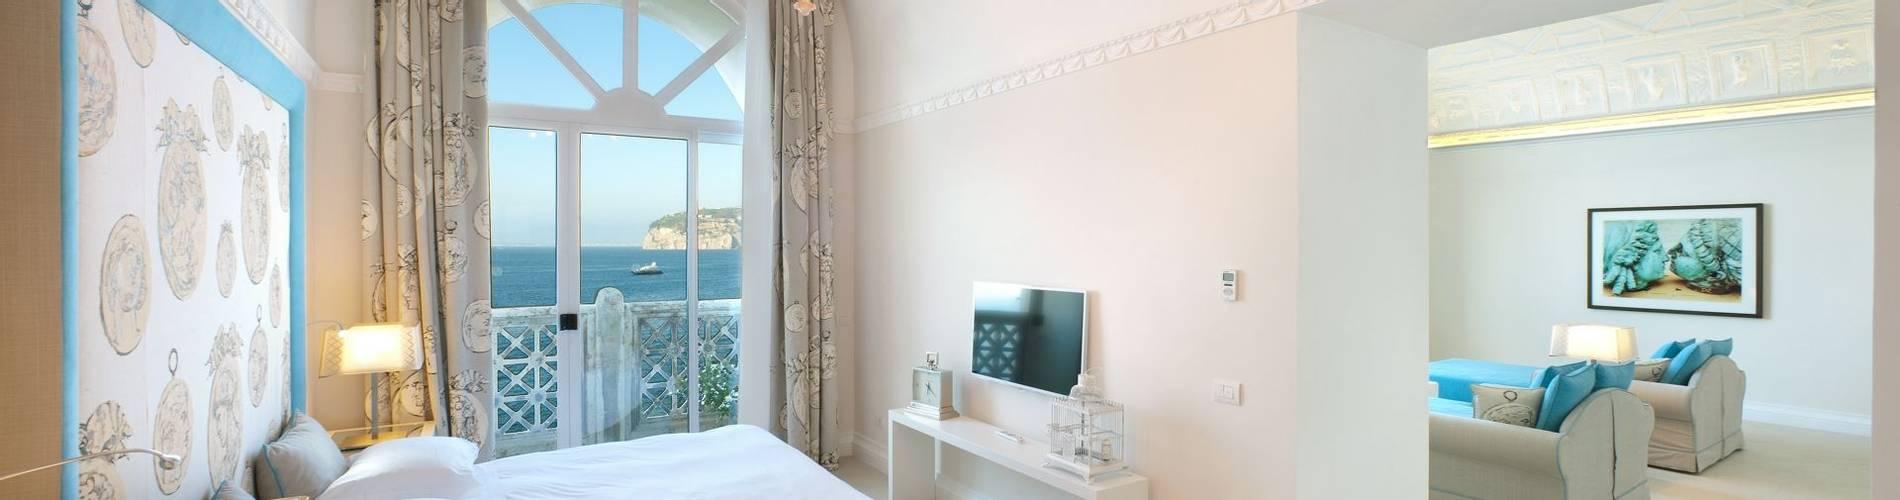 Bellevue Syrene, Sorrento, Italy, De La Syrene Suite (6).JPG